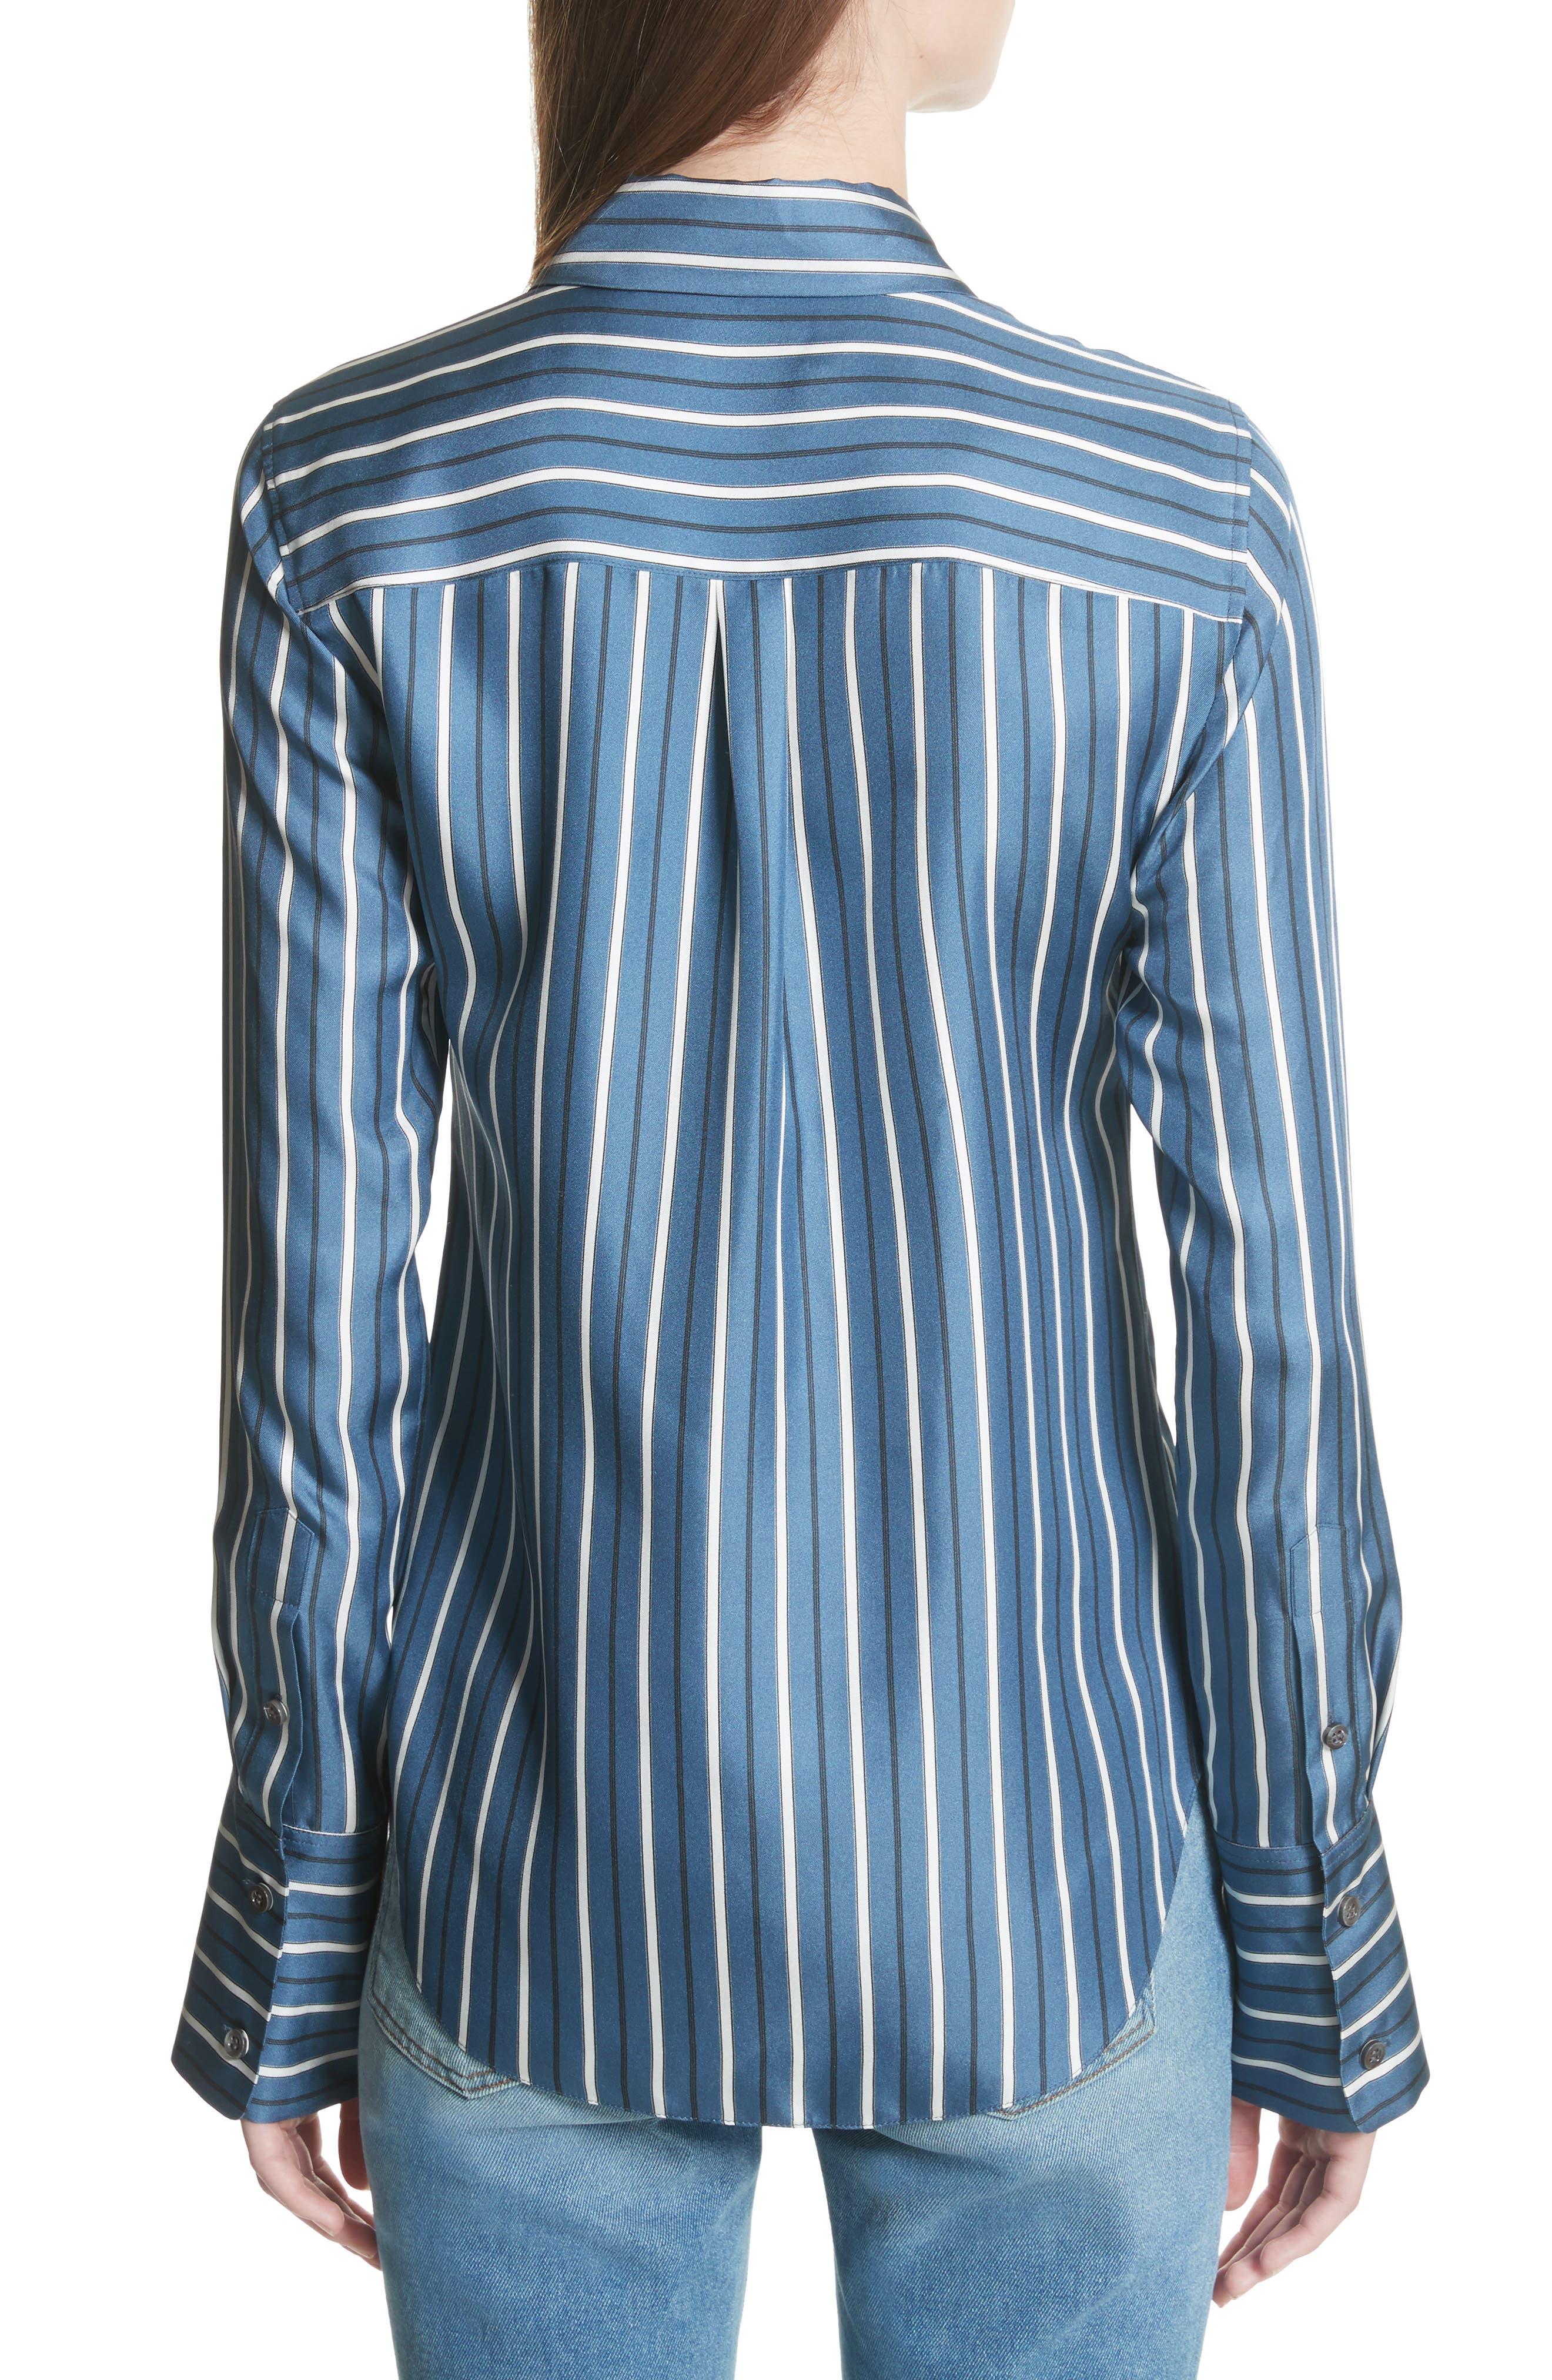 Darby Silk Button Shirt,                             Alternate thumbnail 2, color,                             Light Santorini Blue